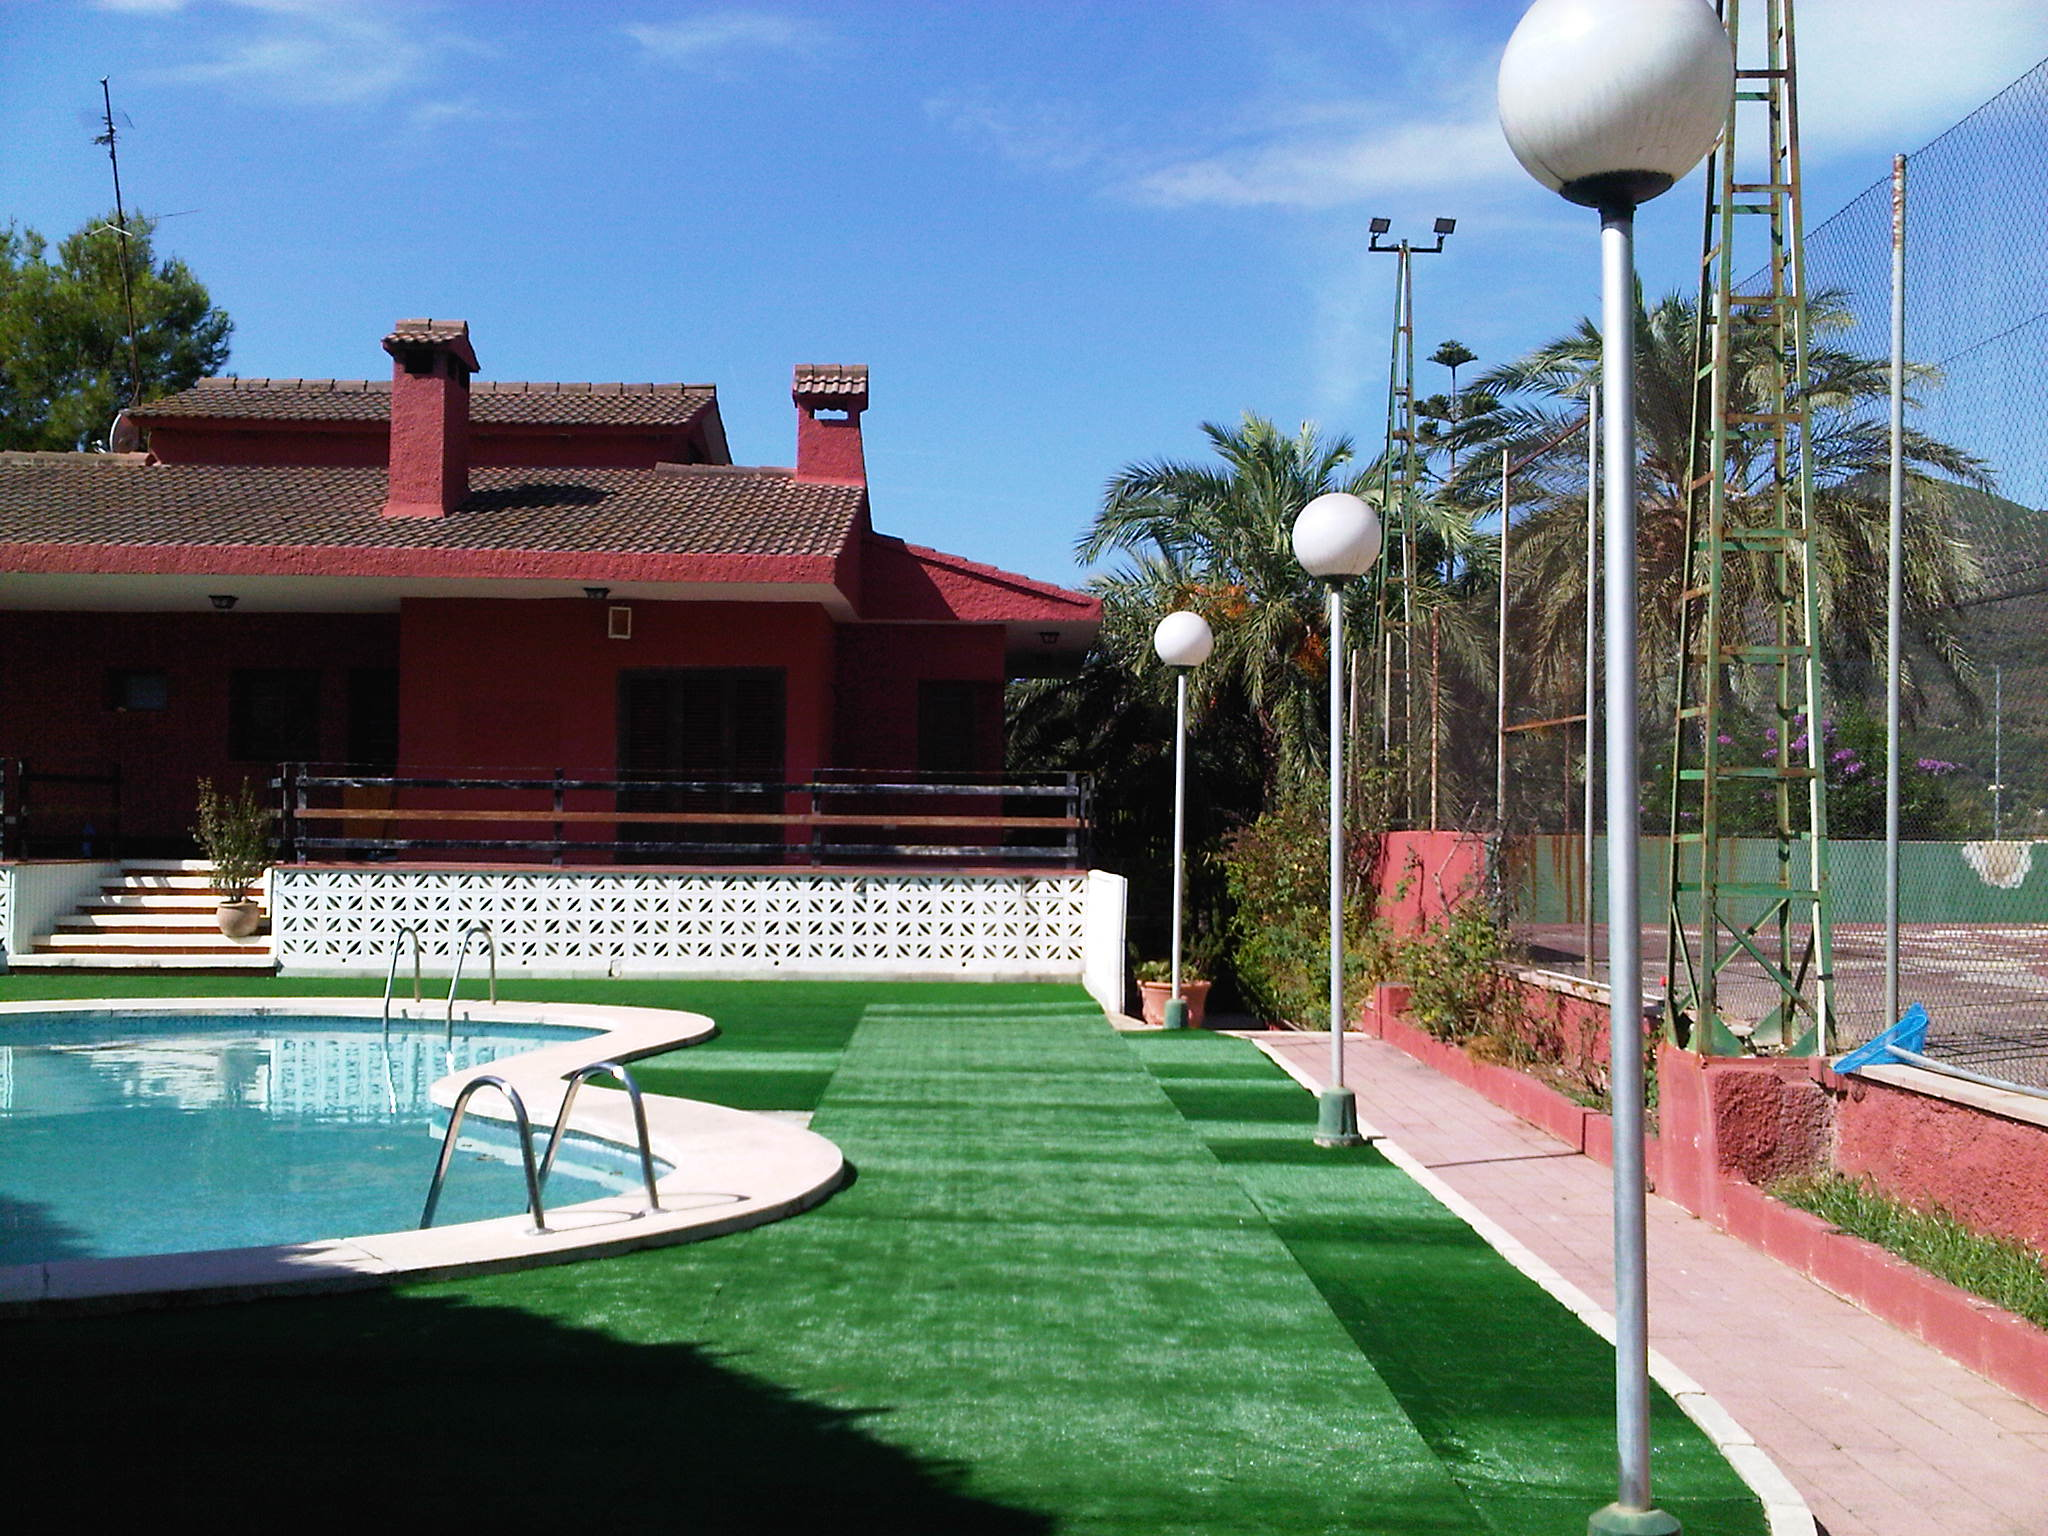 Venda casa de campo albalat dels tarongers valencia espanha les panses - Casa de campo valencia ...